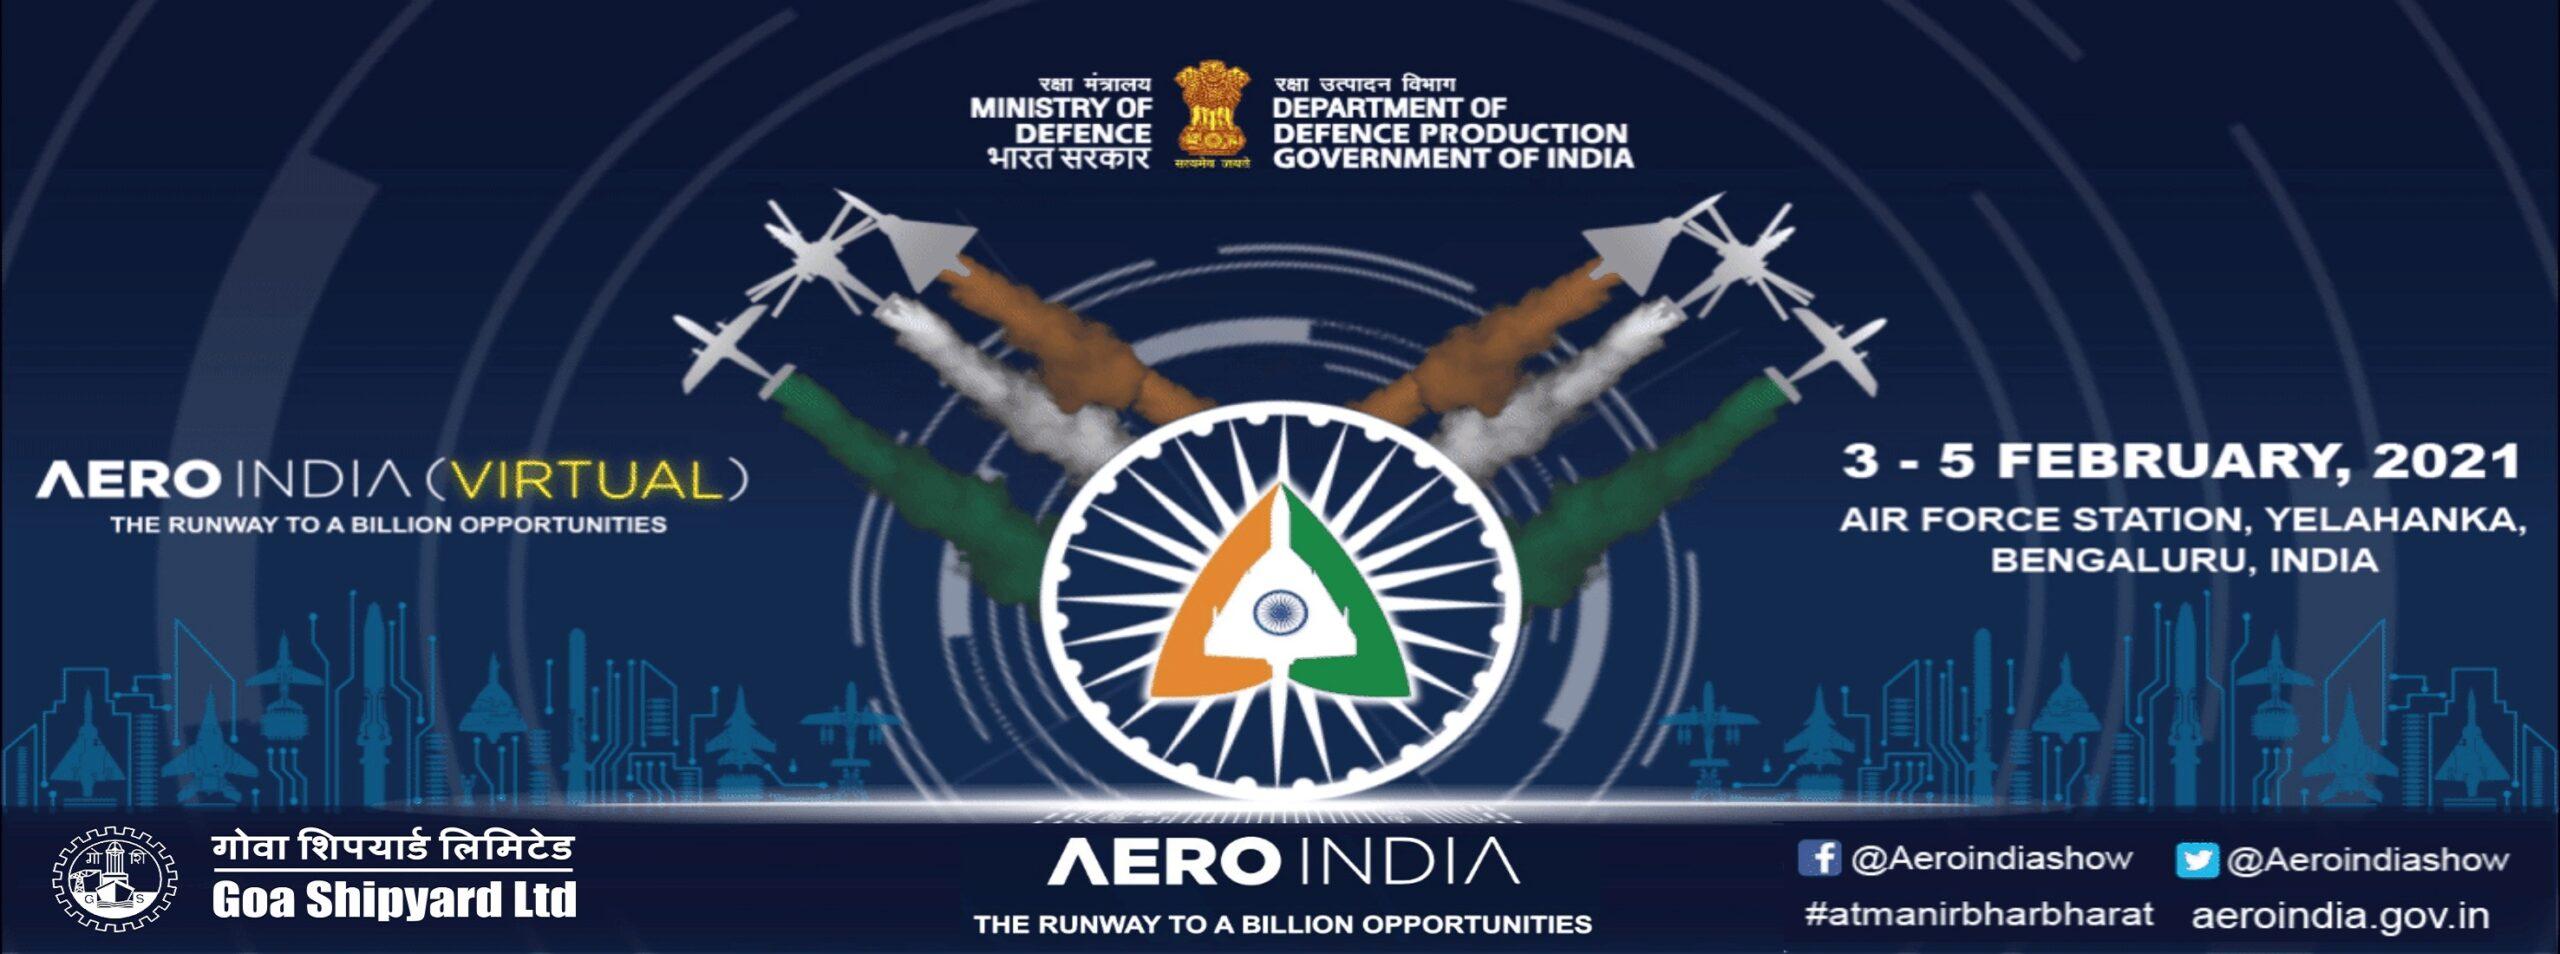 Aero-India-2021-banner-5